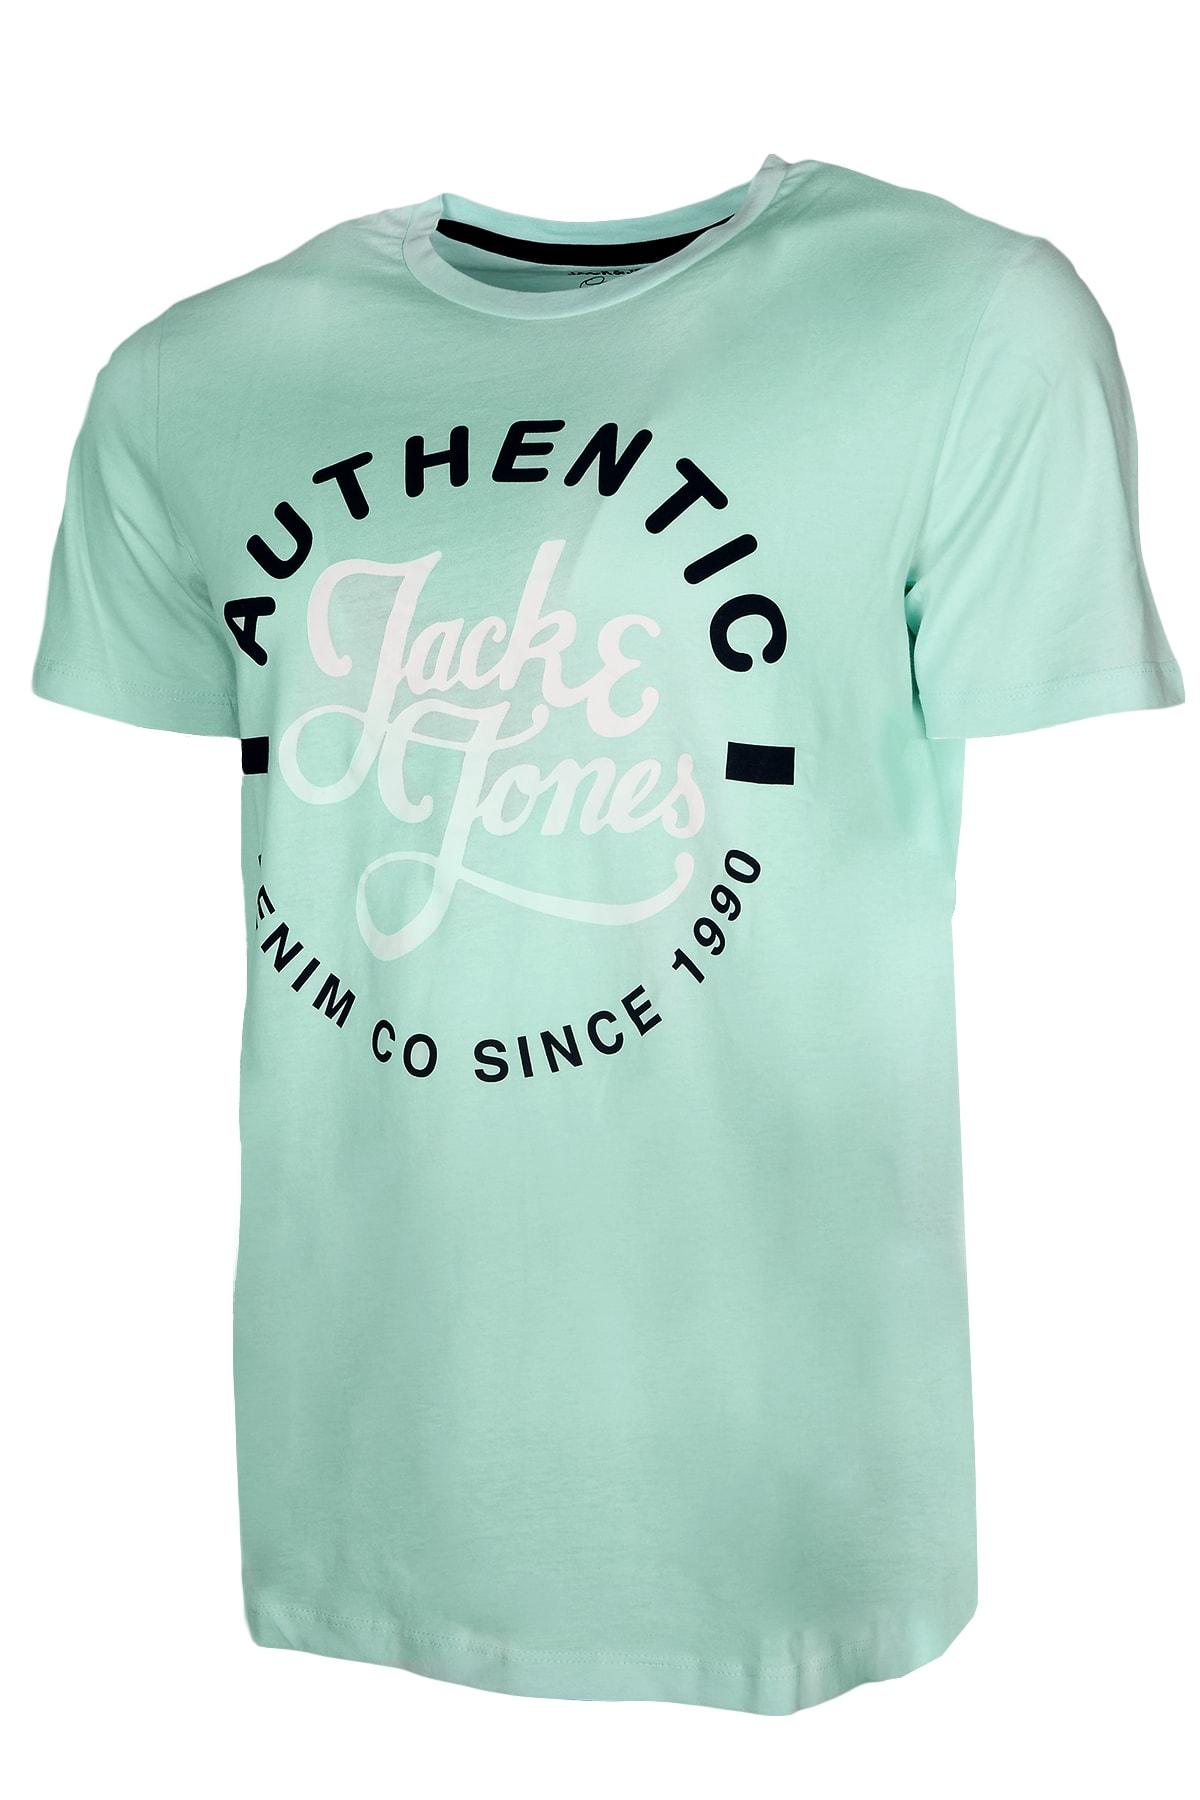 Jack & Jones Erkek Su Yeşili 0 Yaka Tshirt 12182323 2